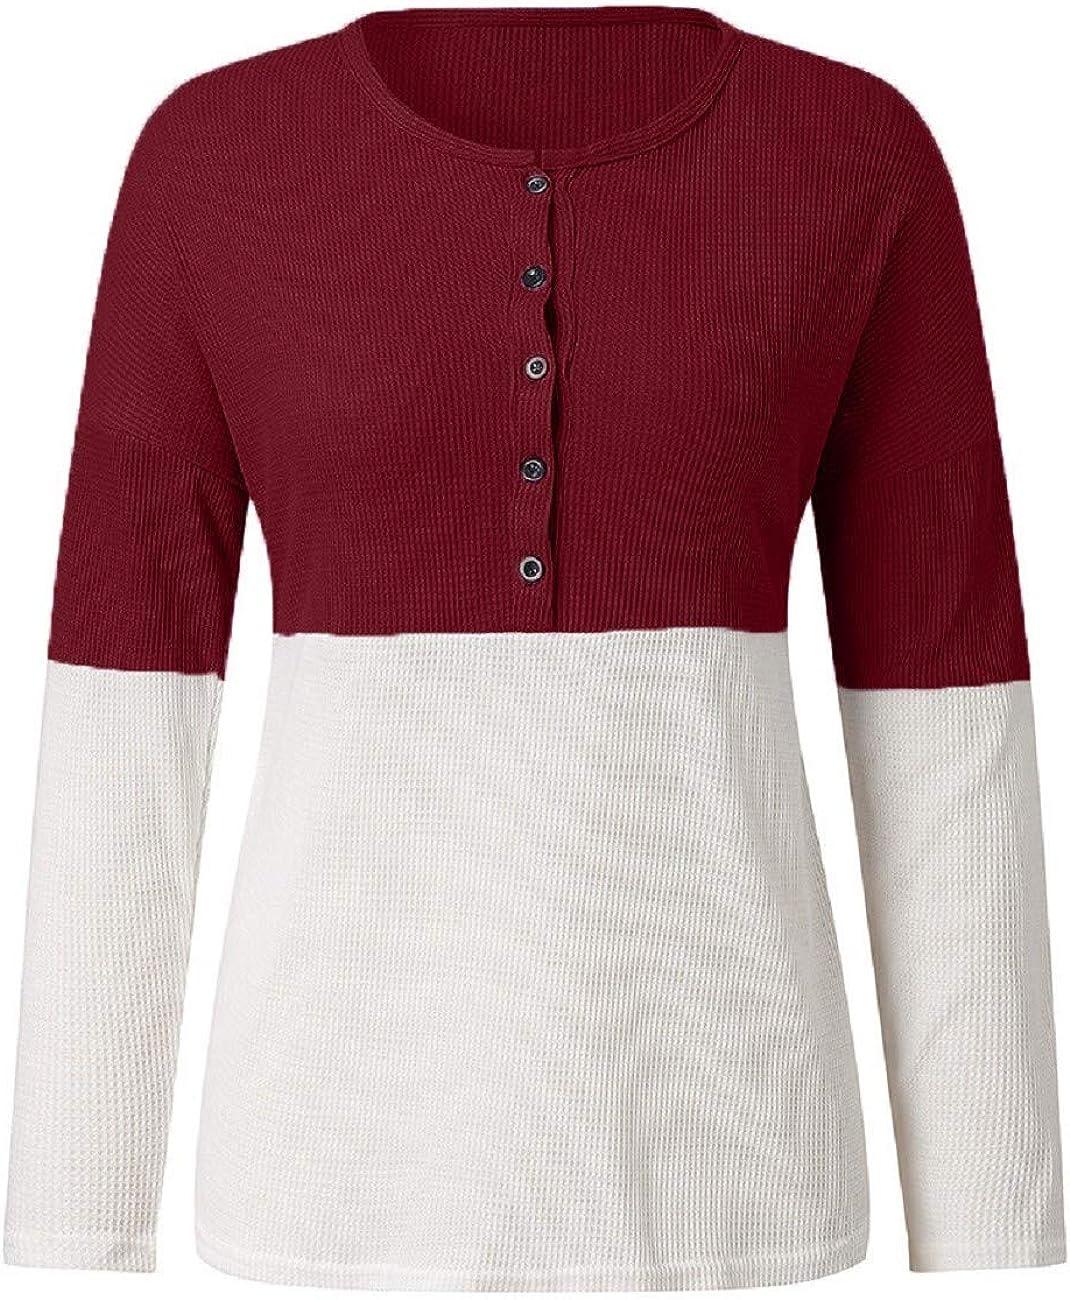 Adreamess Women Sweater Long Sleeve Henley Shirt Casual Waffle Knit Blouse Button Tunic Tops